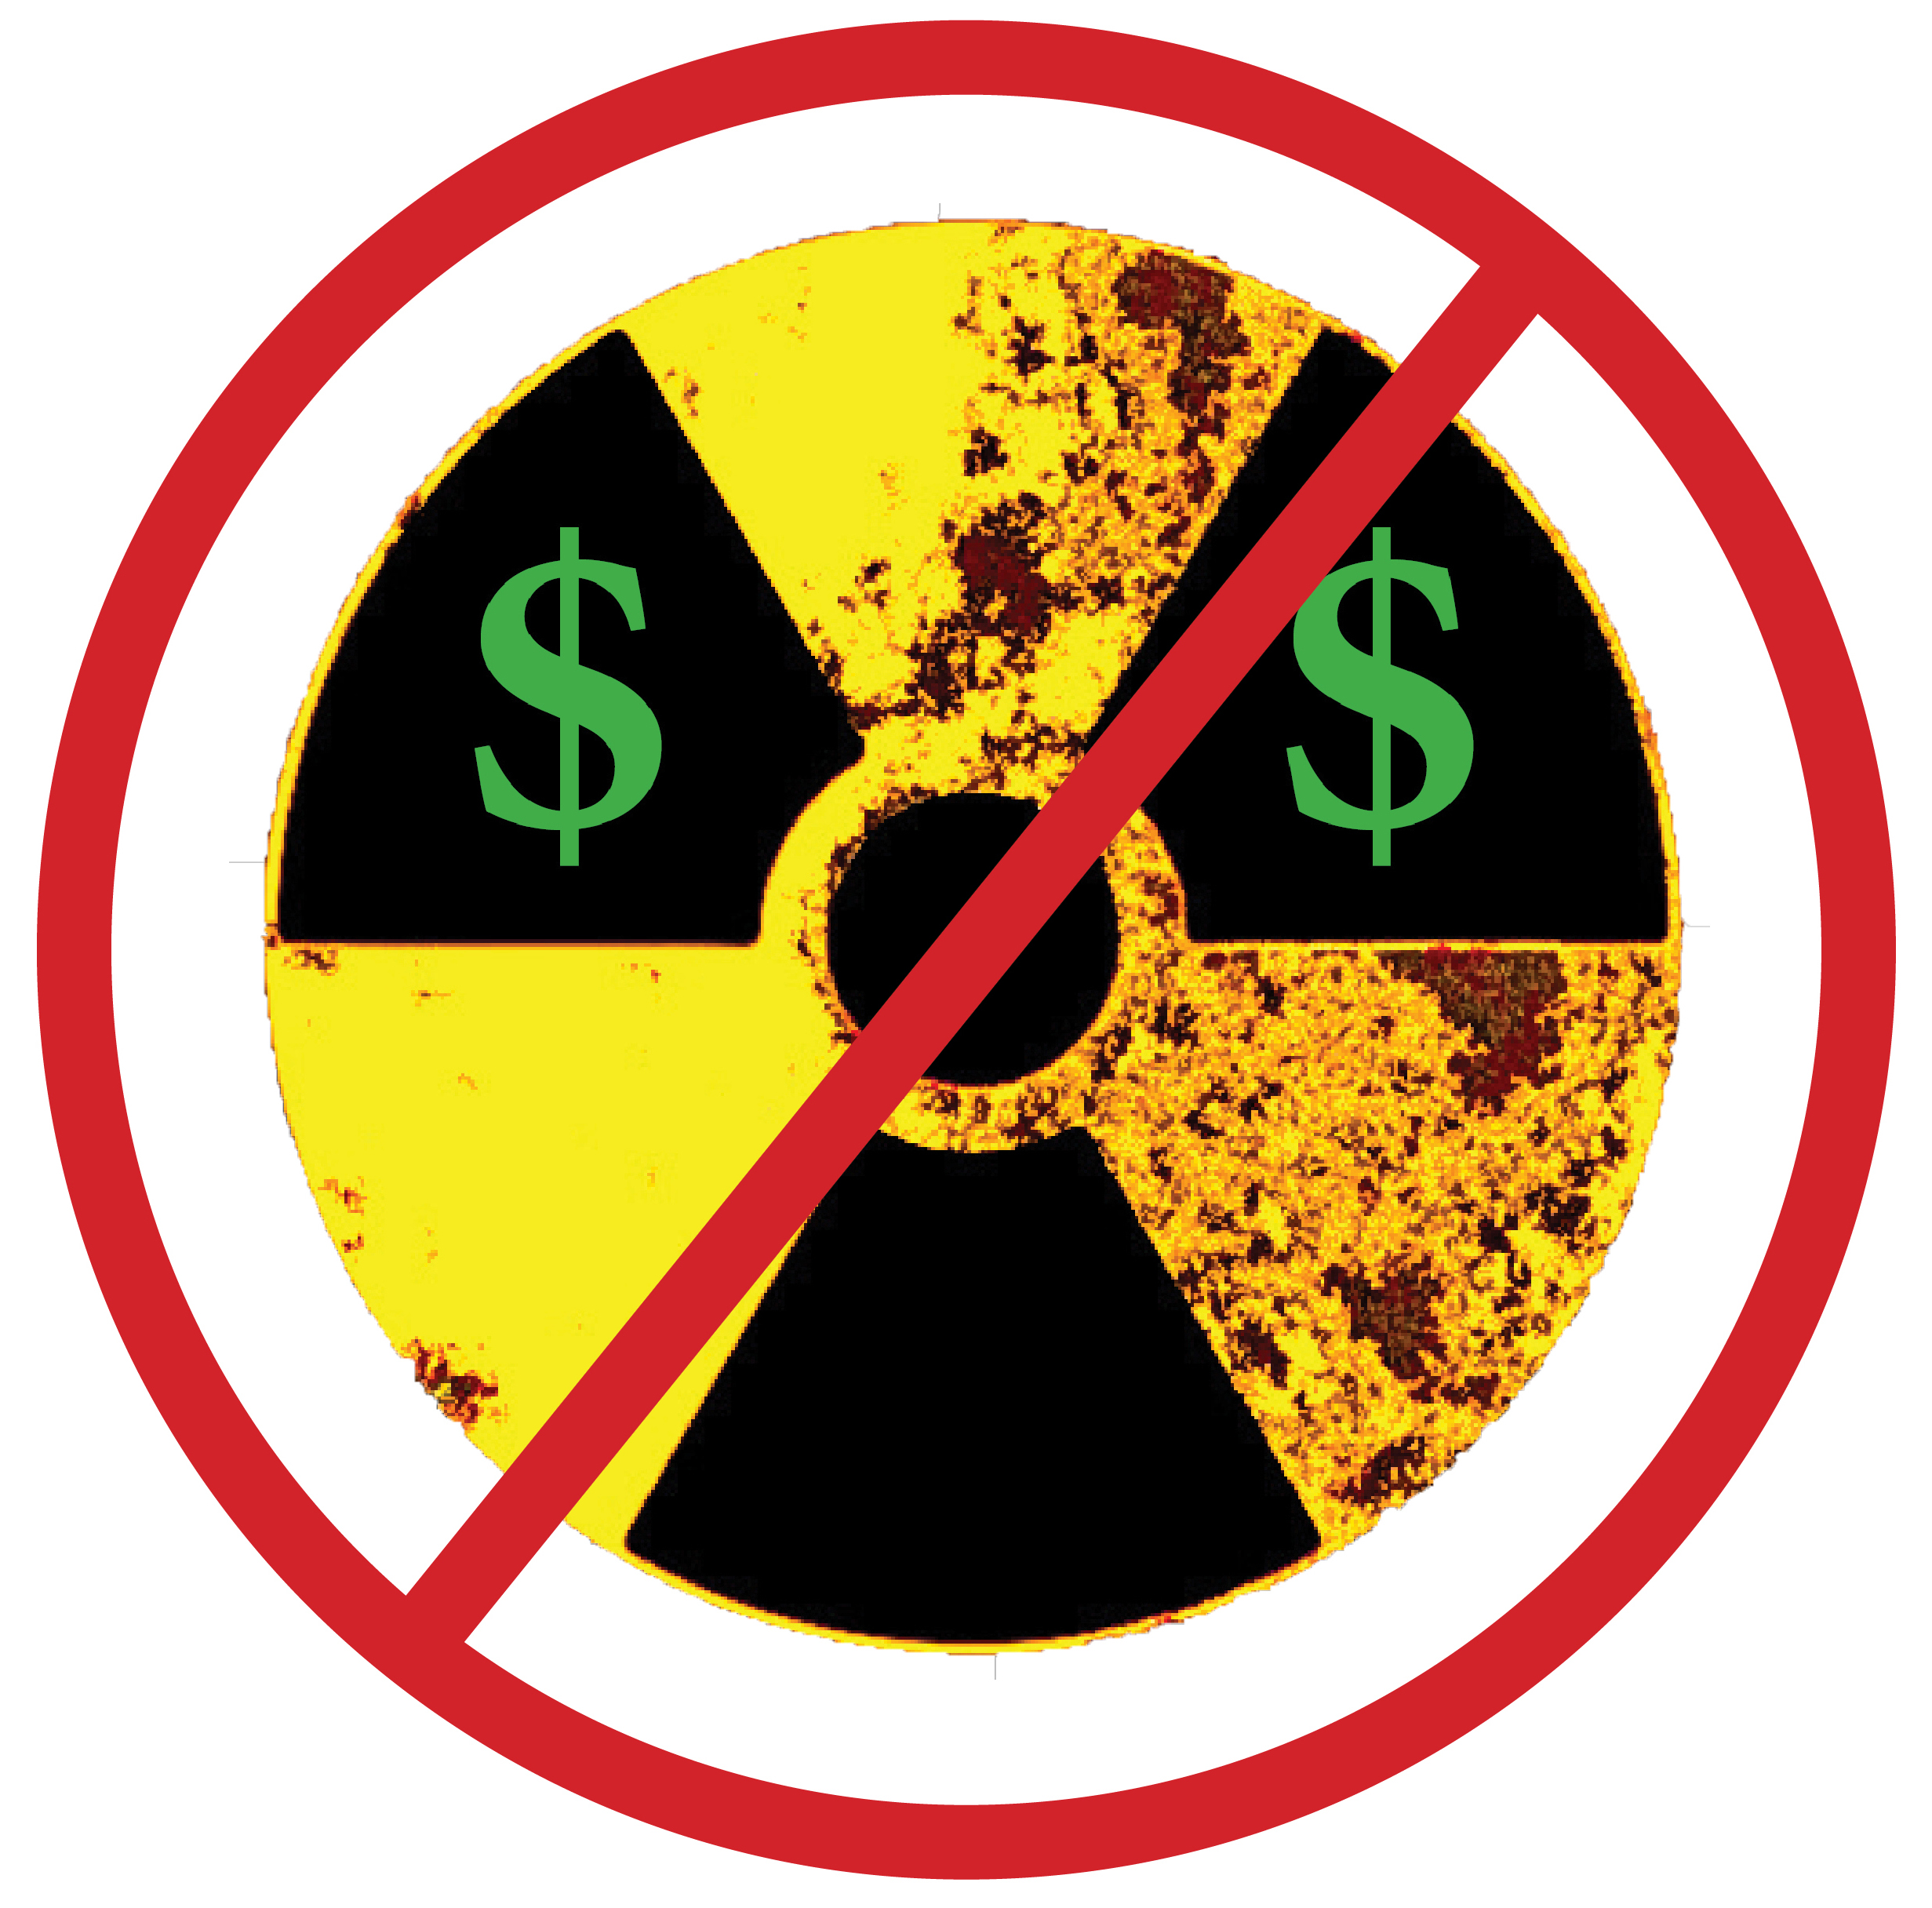 Radiation symbol NO overlay.jpg